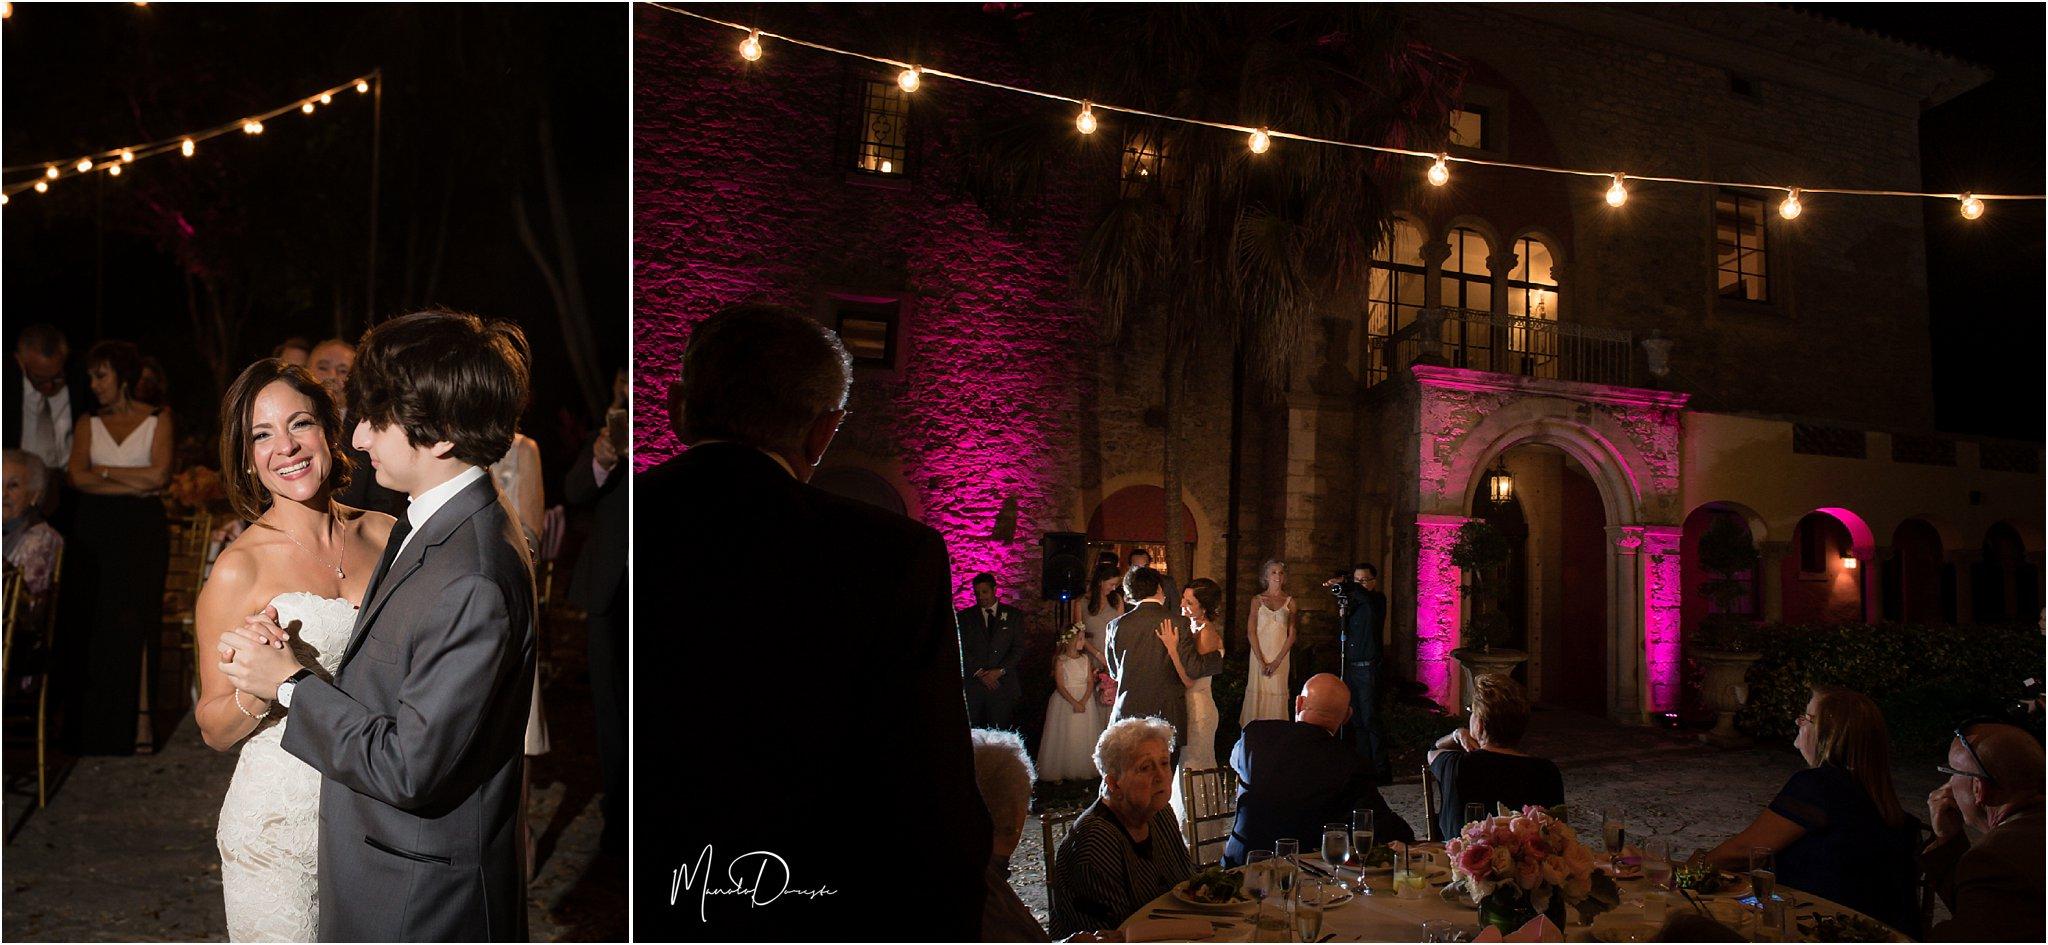 00847_ManoloDoreste_InFocusStudios_Wedding_Family_Photography_Miami_MiamiPhotographer.jpg